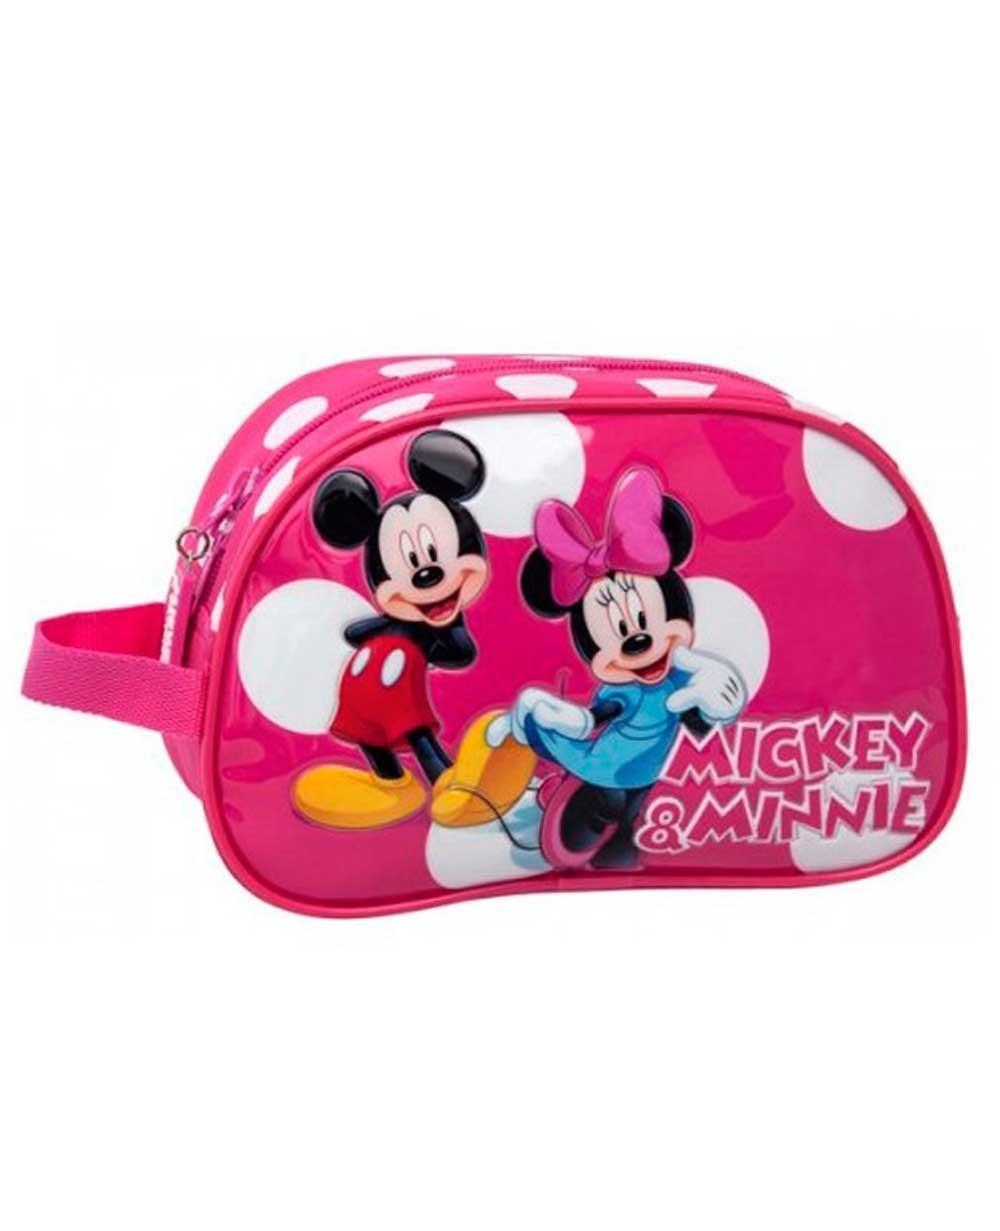 Mickey & Minnie Lunares Neceser Rosa (Foto )